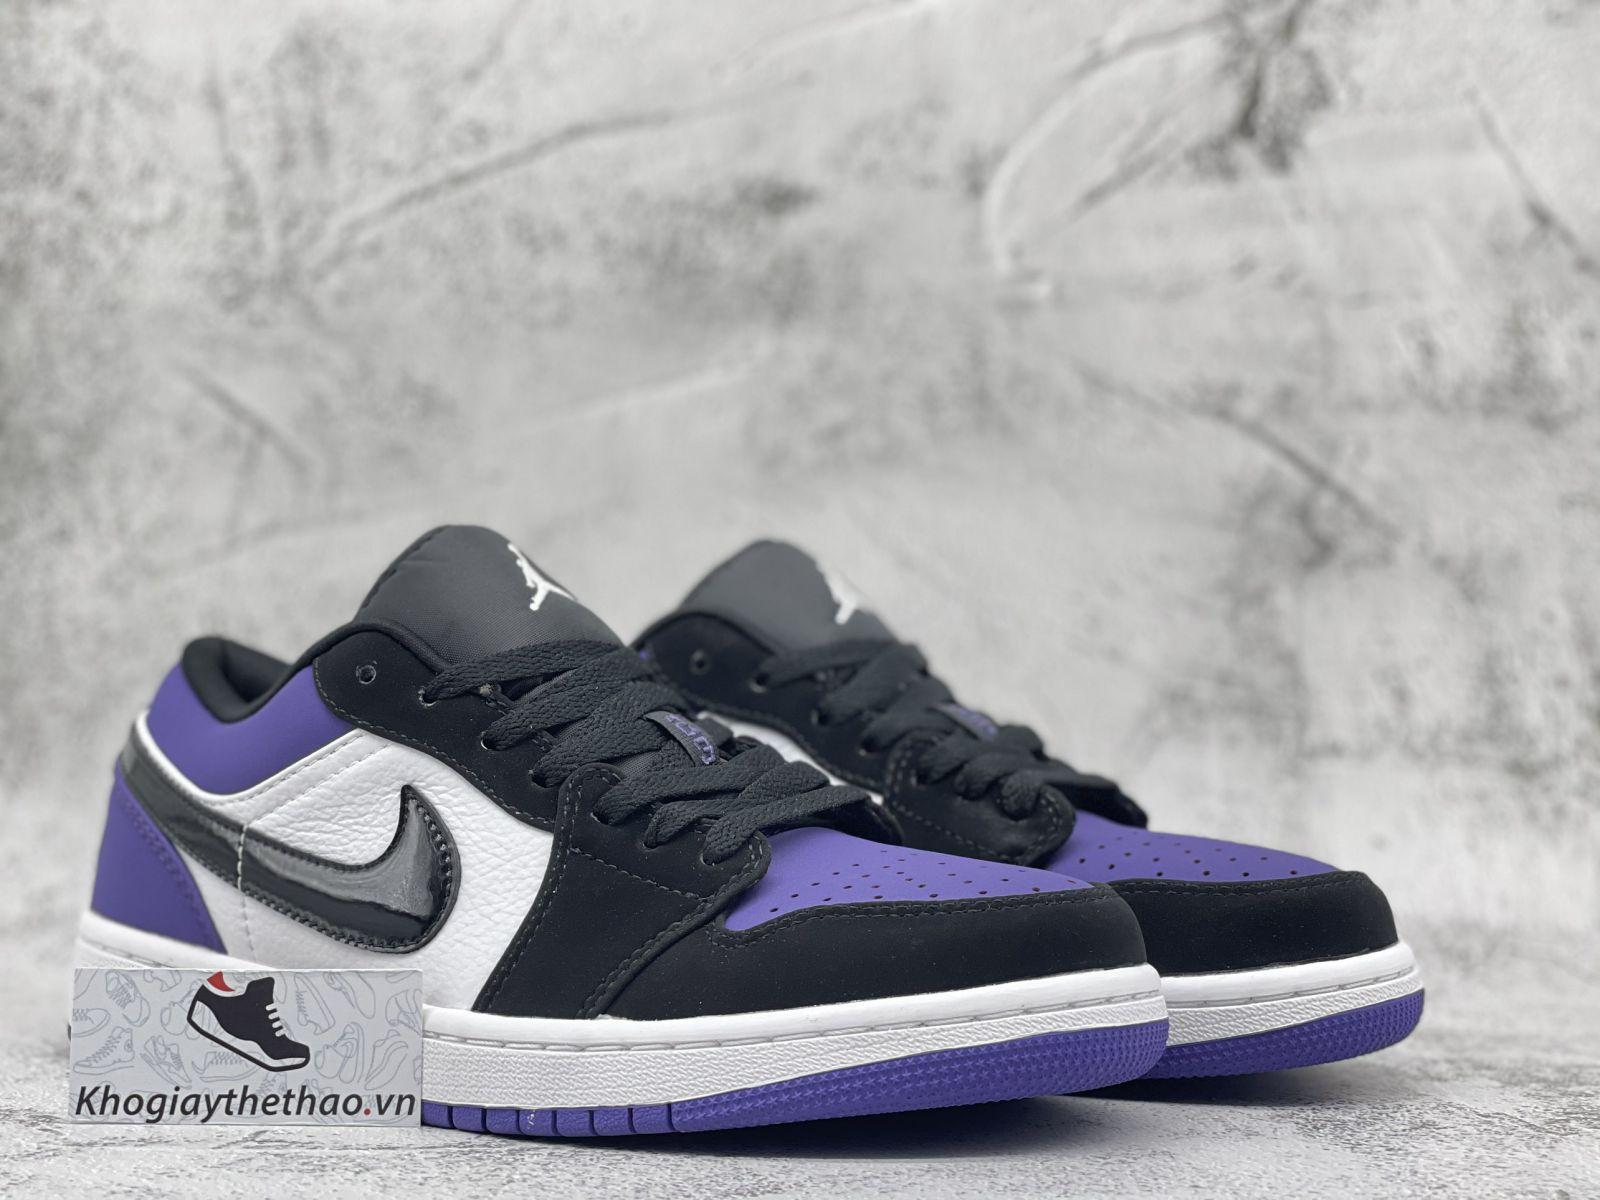 Giày Nike Air Jordan 1 Low Court Purple